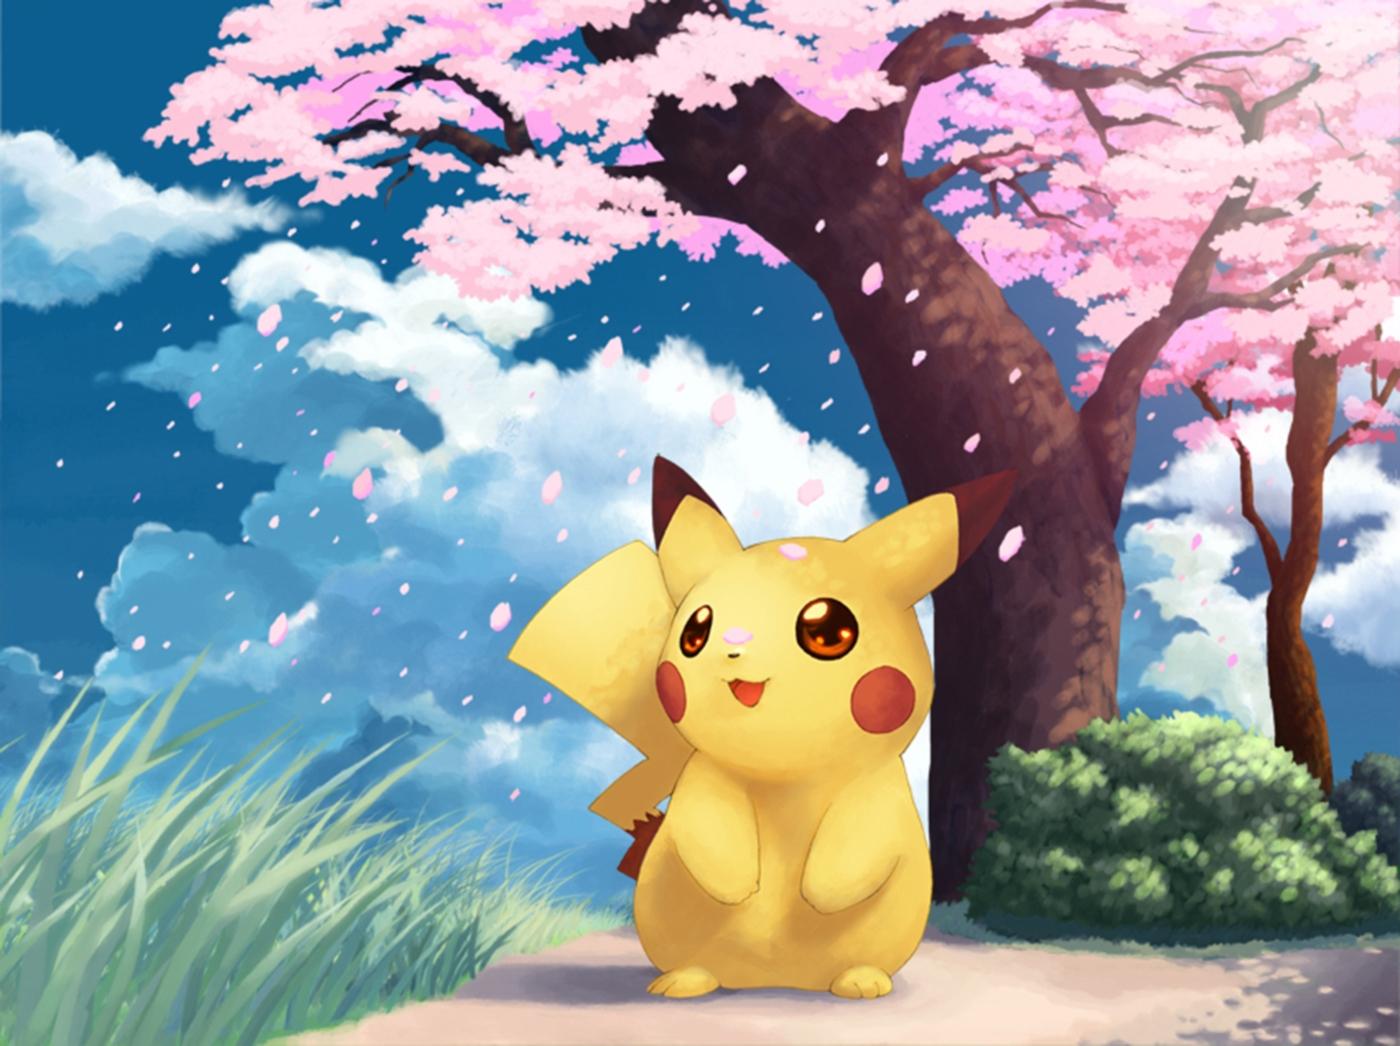 Outil de redimenssionnement manuel weesk studio - Pikachu dessin anime ...